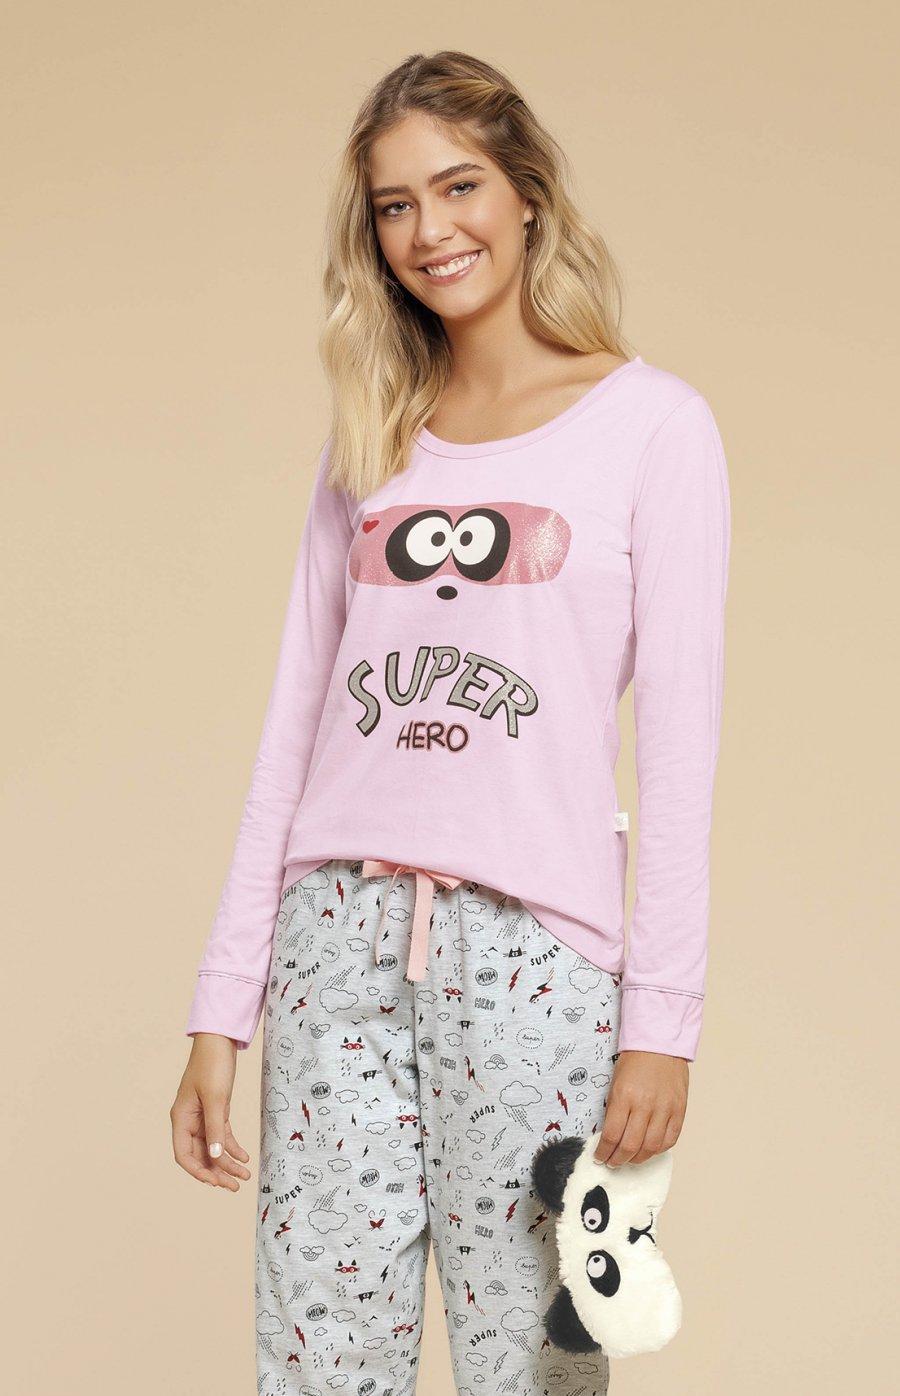 Pijama Meia Malha Super Family Inverno 2019 CLOUD CLUB